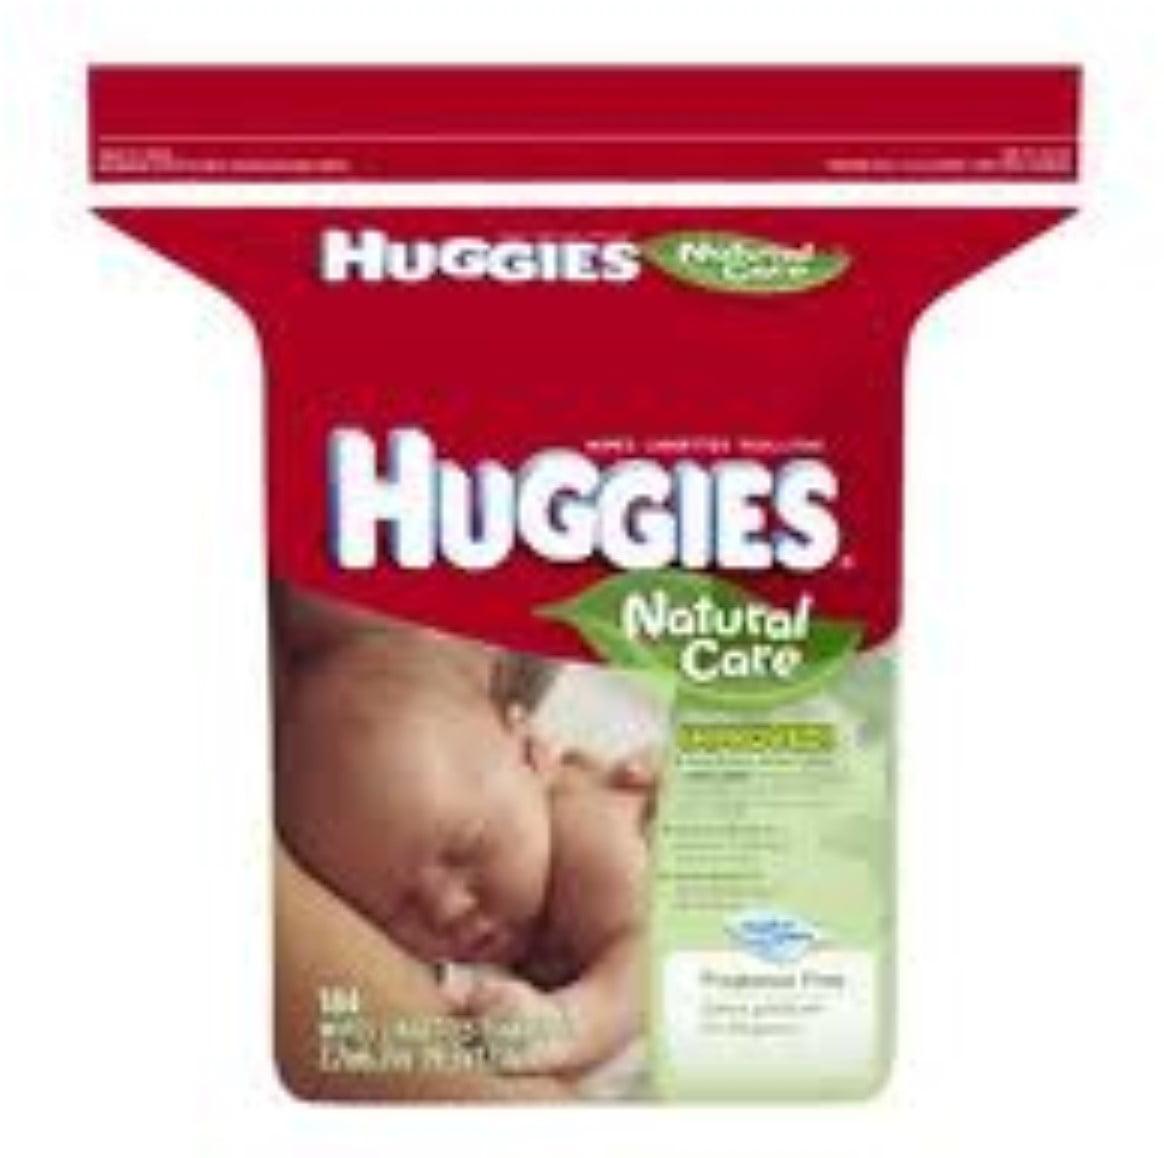 Huggies Natural Care Fragrance-Free Wipes 184 ea (Pack of 6) by HUGGIES